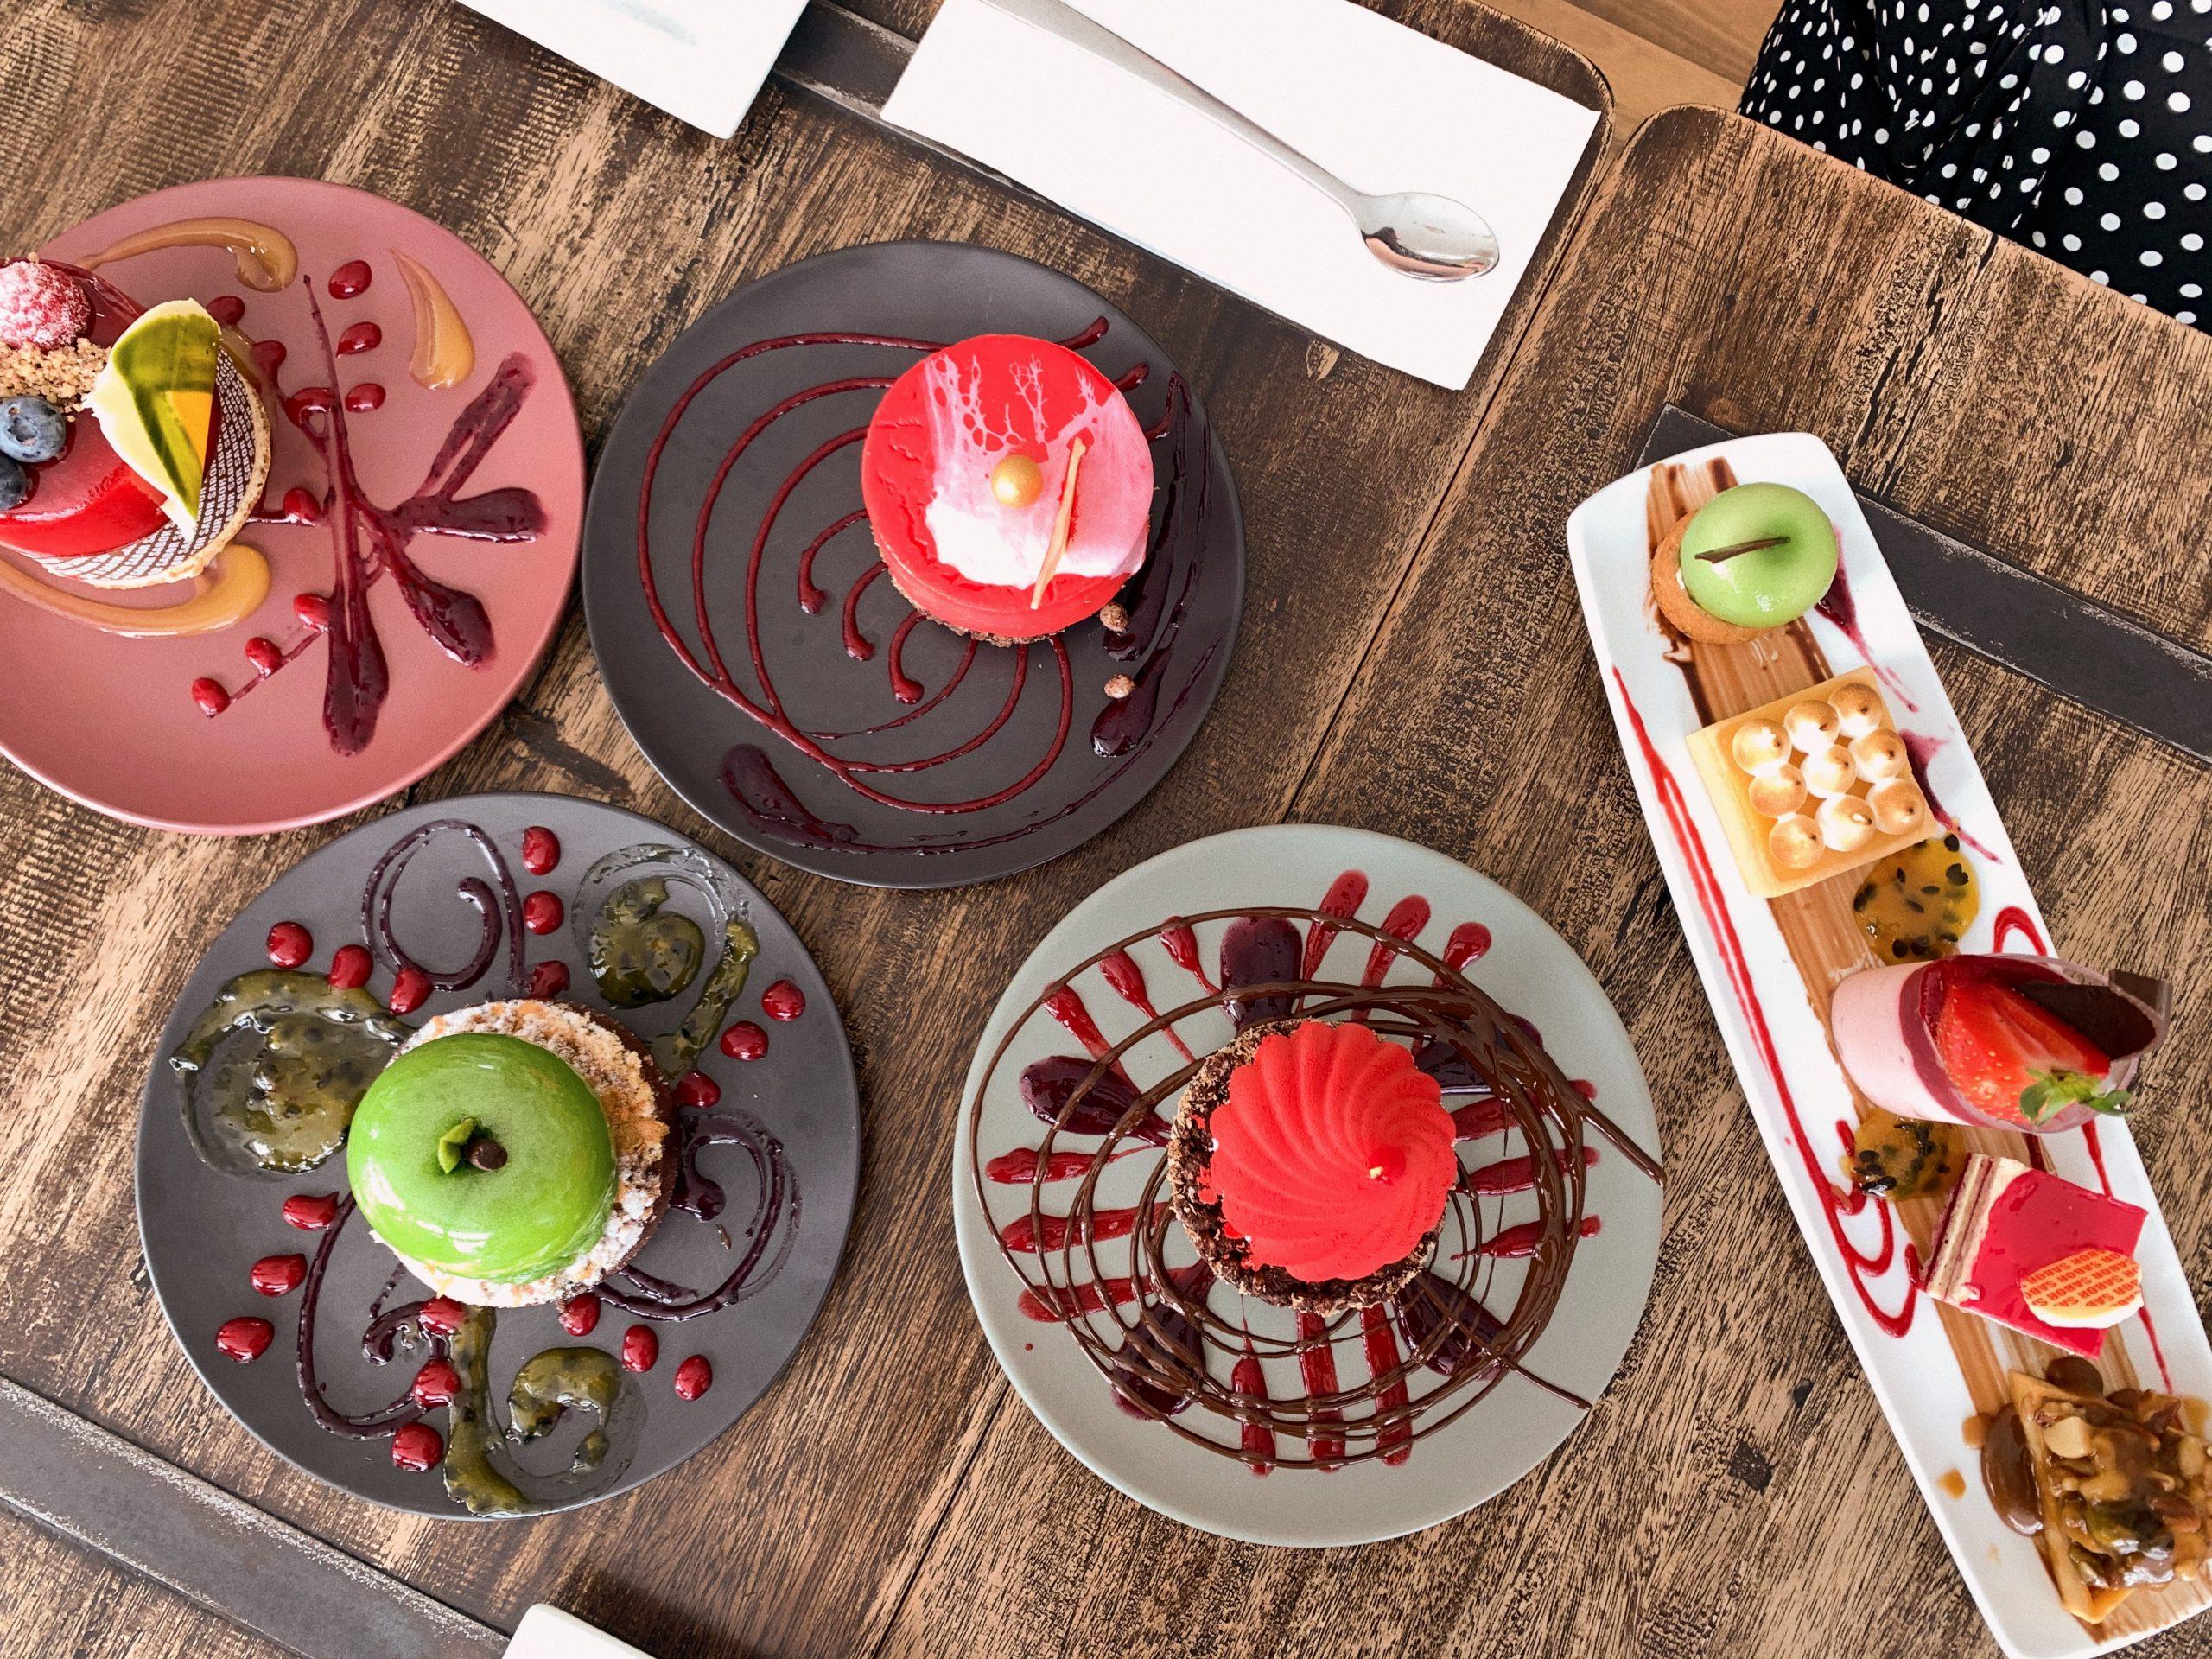 sabor dessert bar hunter valley instagram apple tart cakes